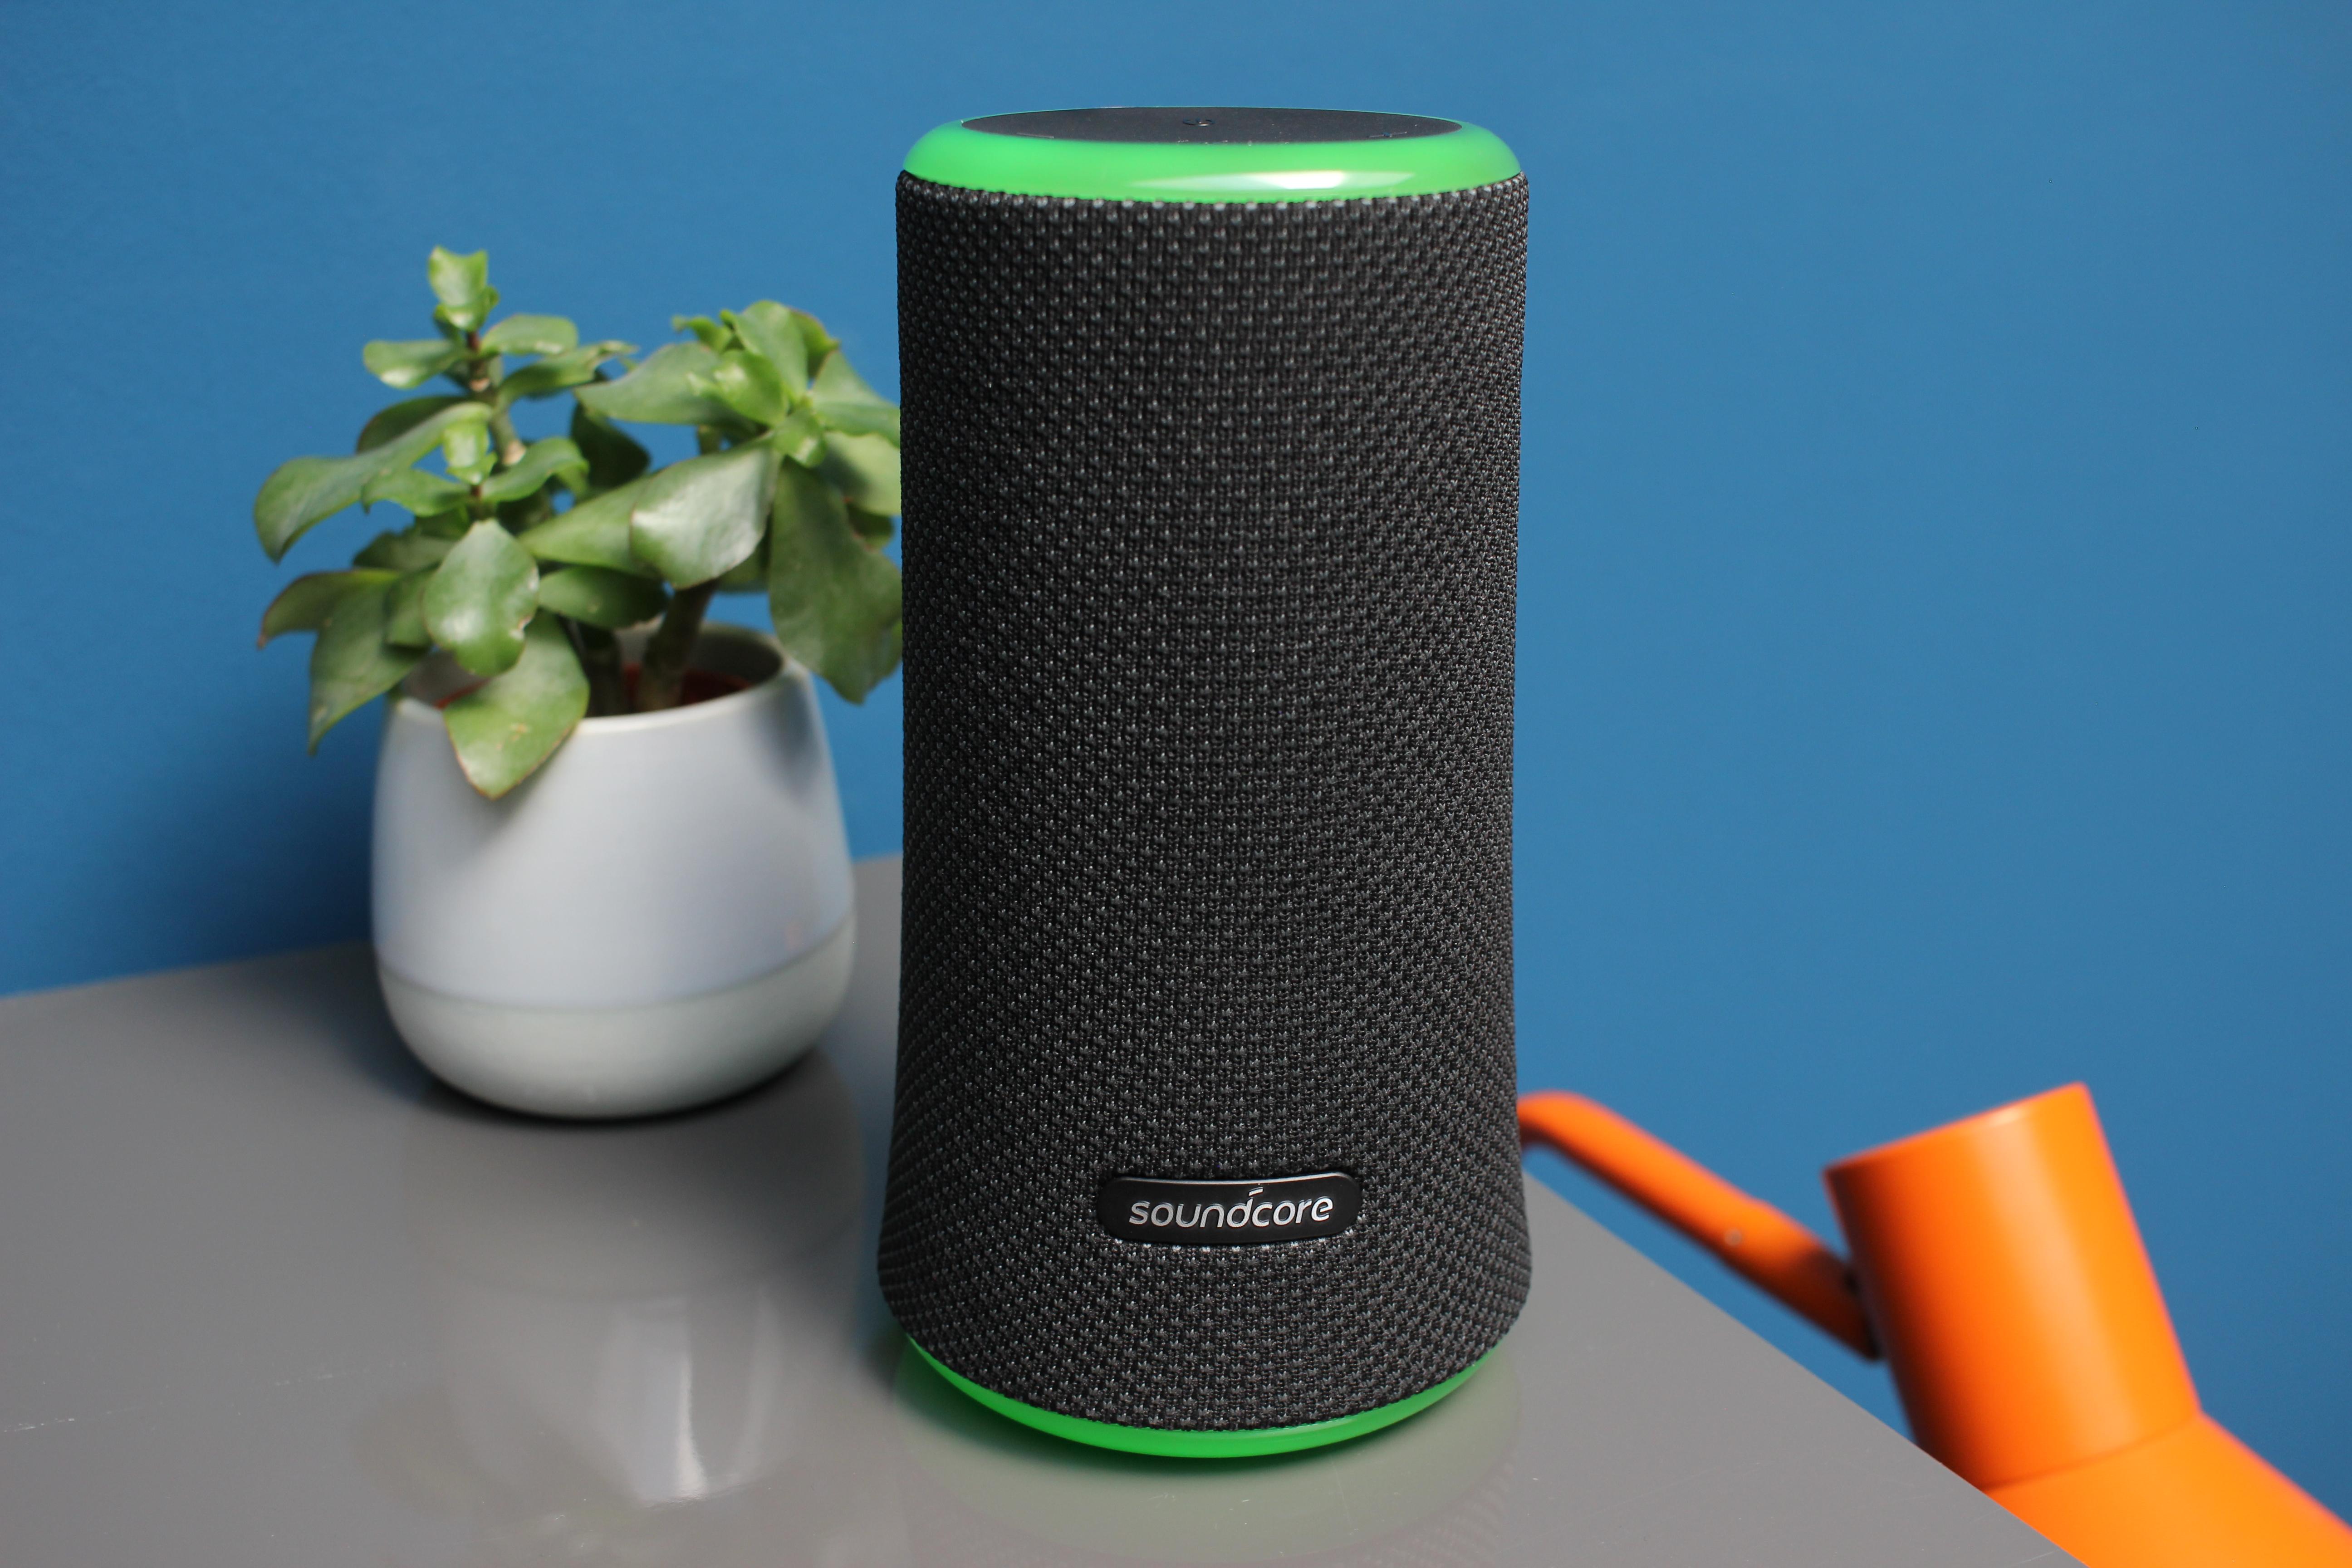 anker soundcore flare 2 test party lautsprecher mit 360 sound leds. Black Bedroom Furniture Sets. Home Design Ideas